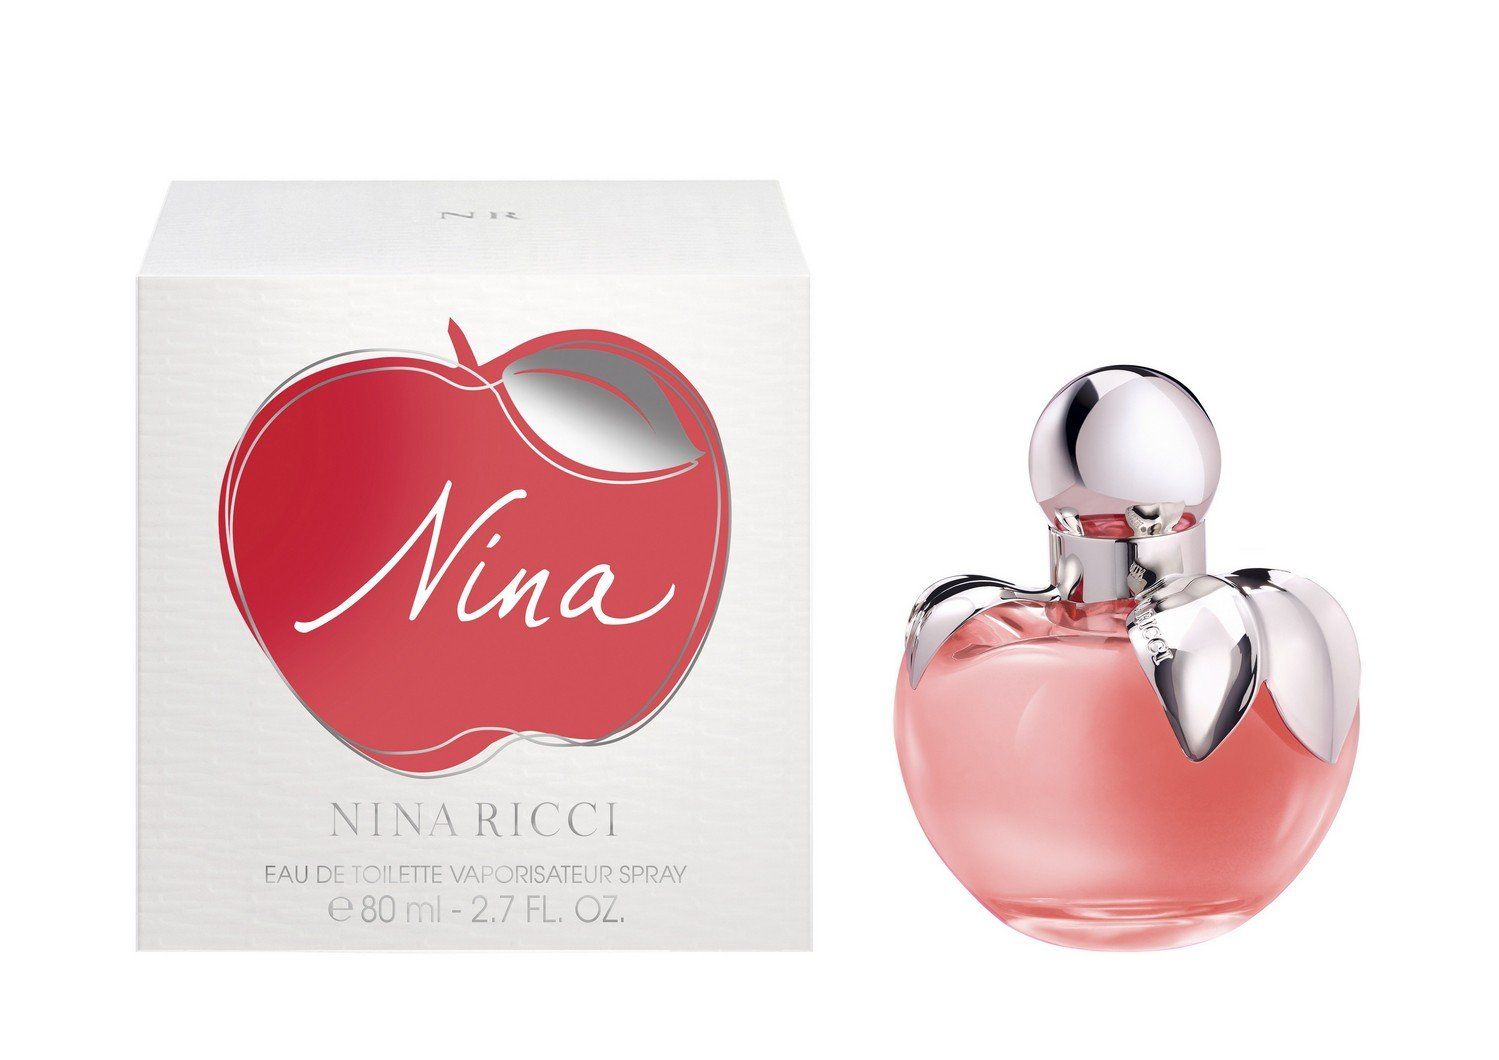 Nina By Nina Ricci For Women. Eau De Toilette Spray 2.7-Ounces 99 Perfumes CA Dropship 152119 26921_-80ml